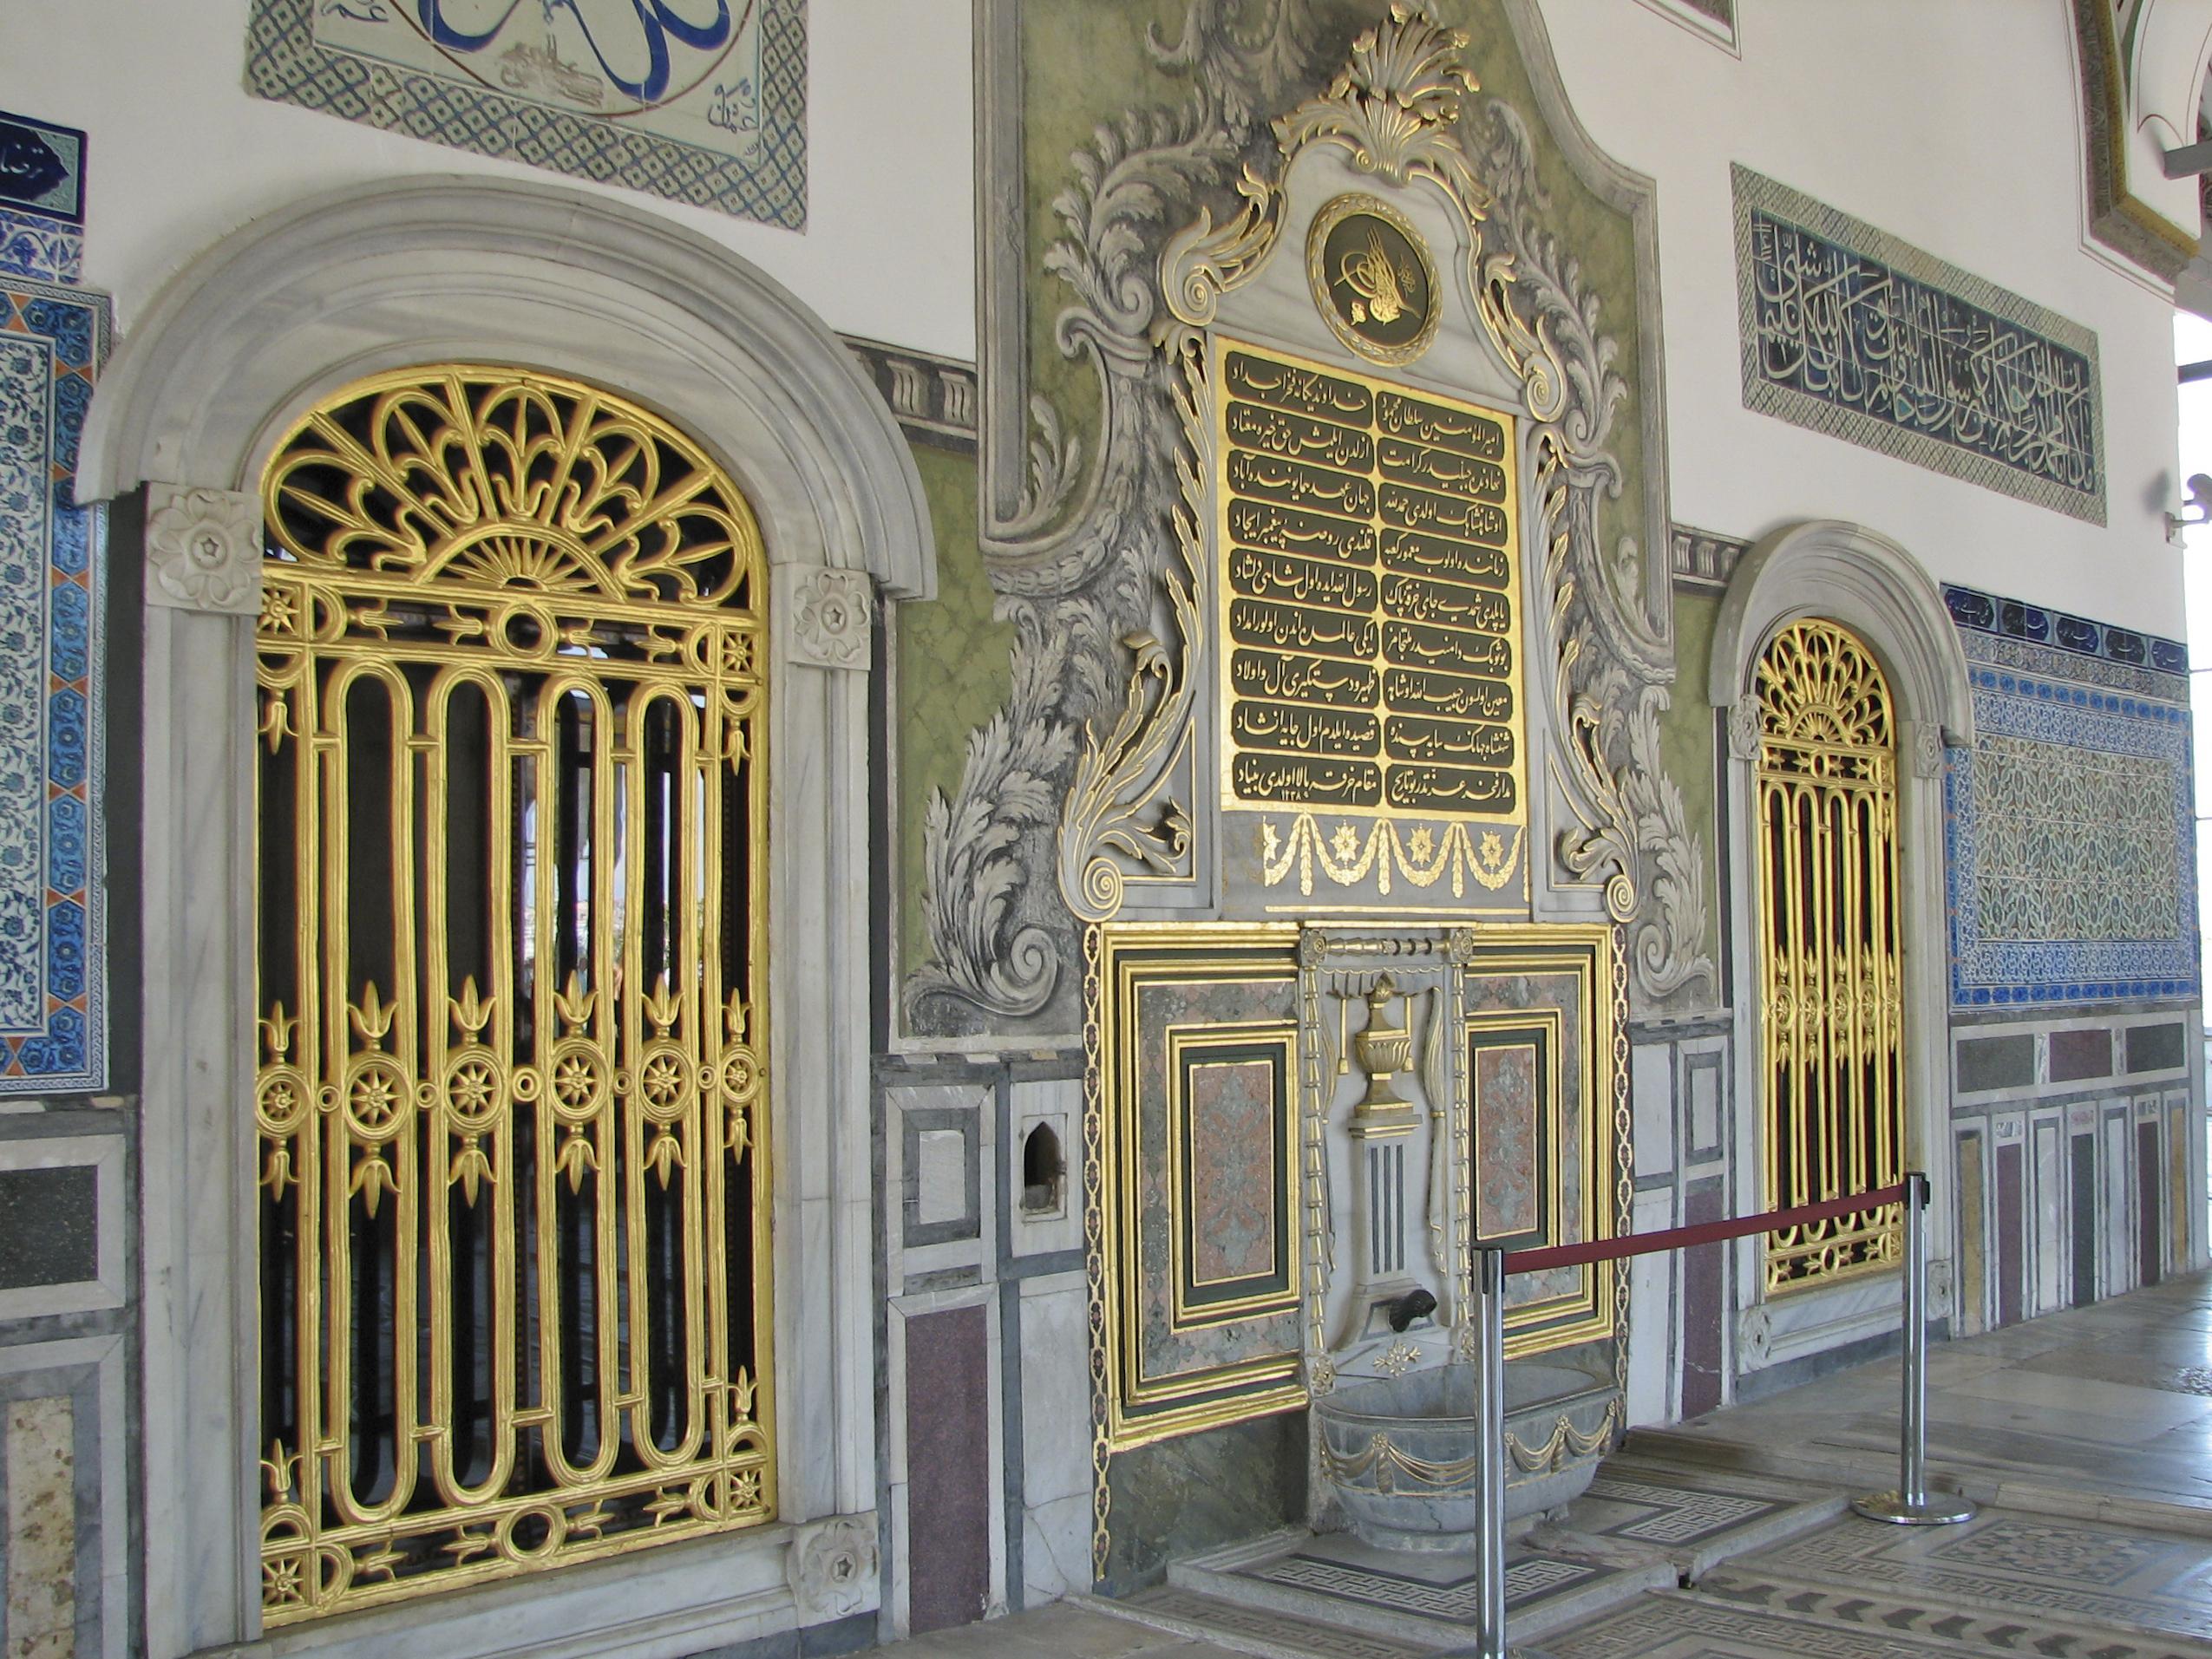 File:Topkapi Palace - Istanbul - 12.jpg - Wikimedia Commons